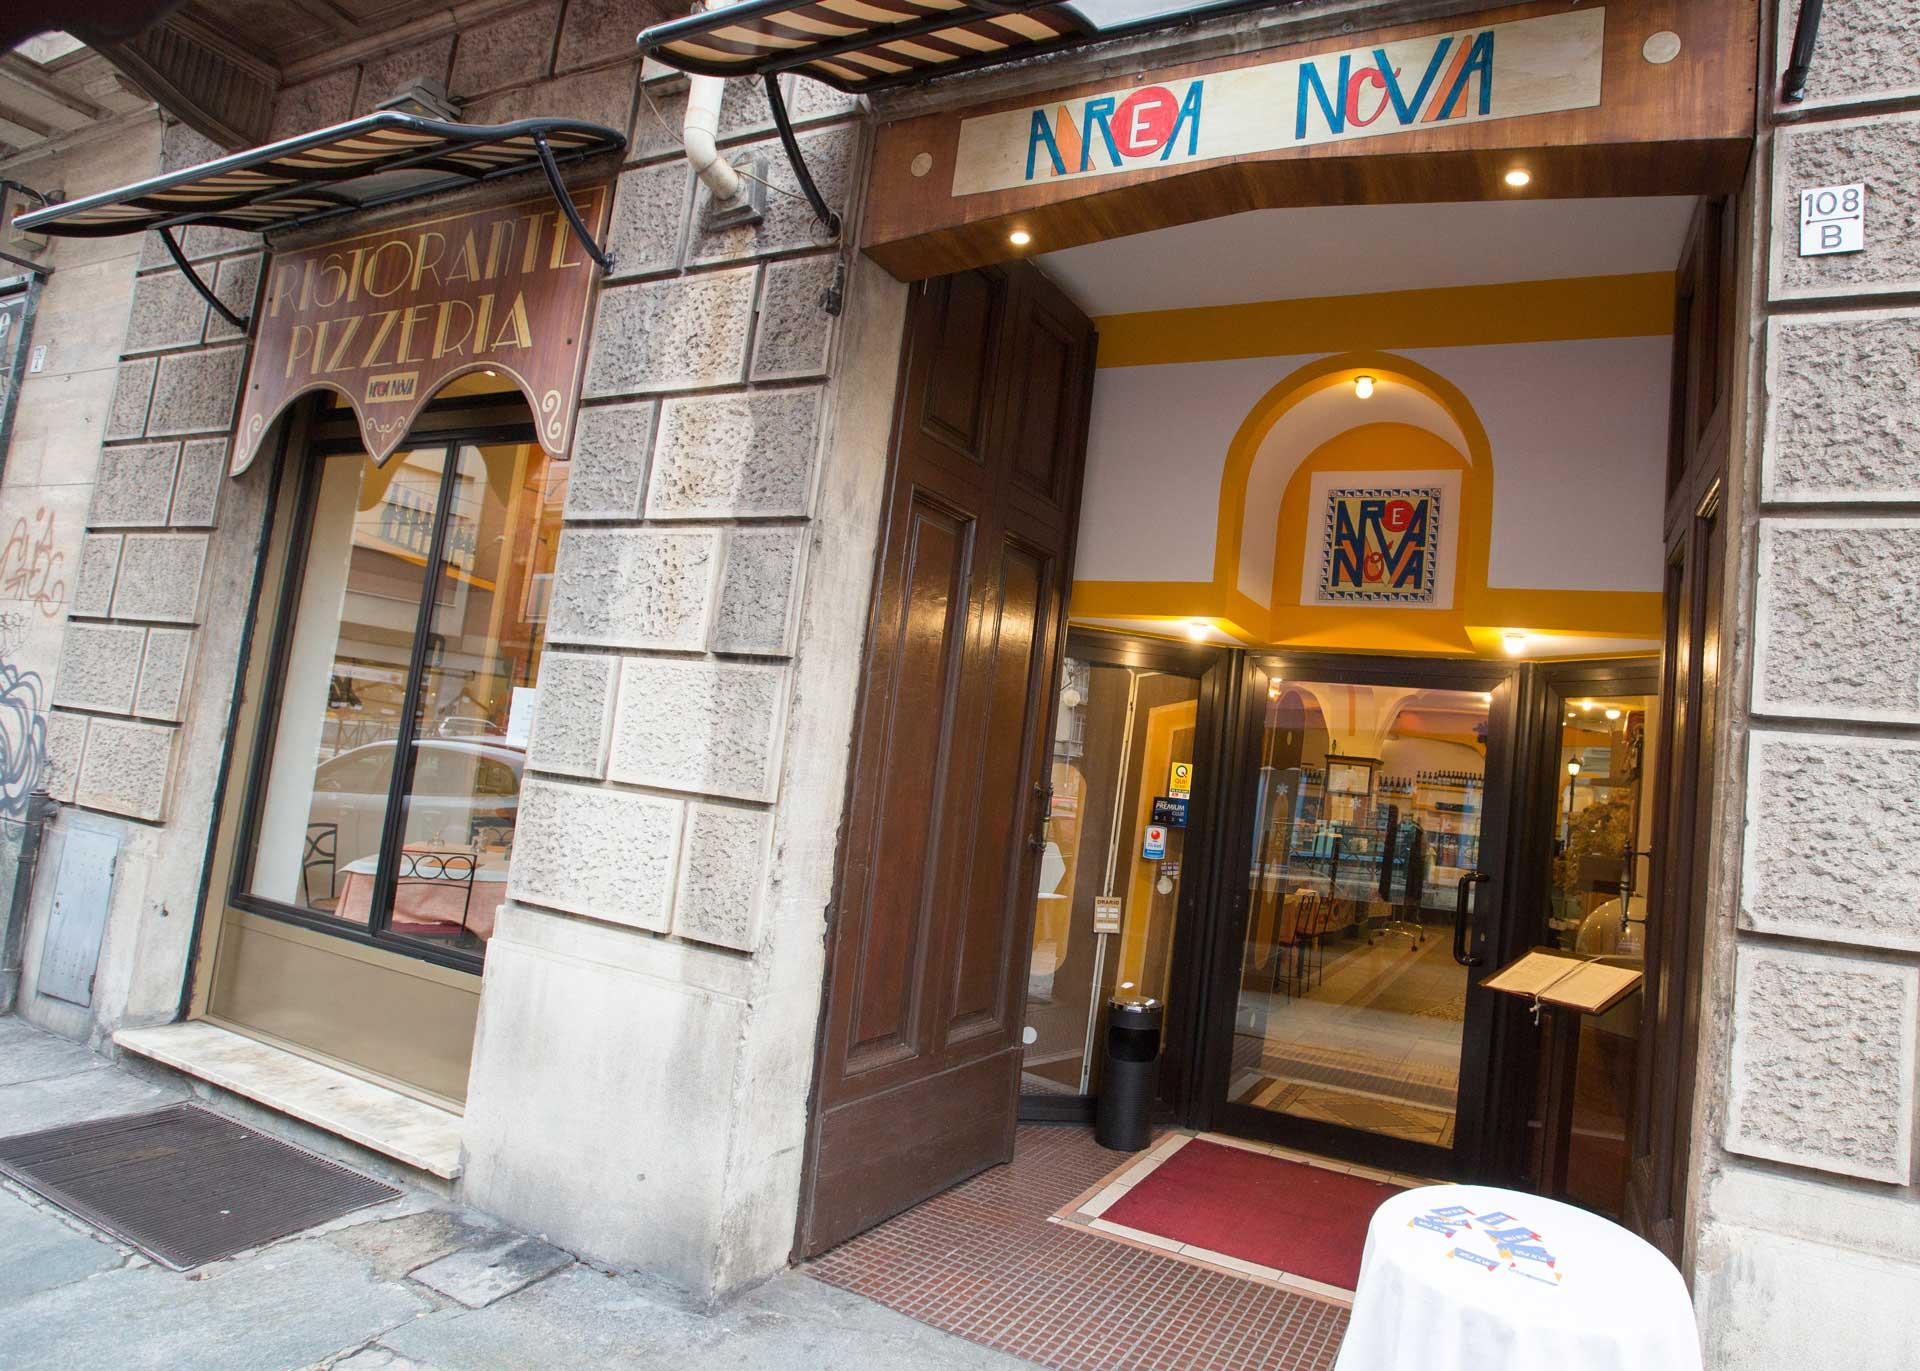 Area Nova – Torino